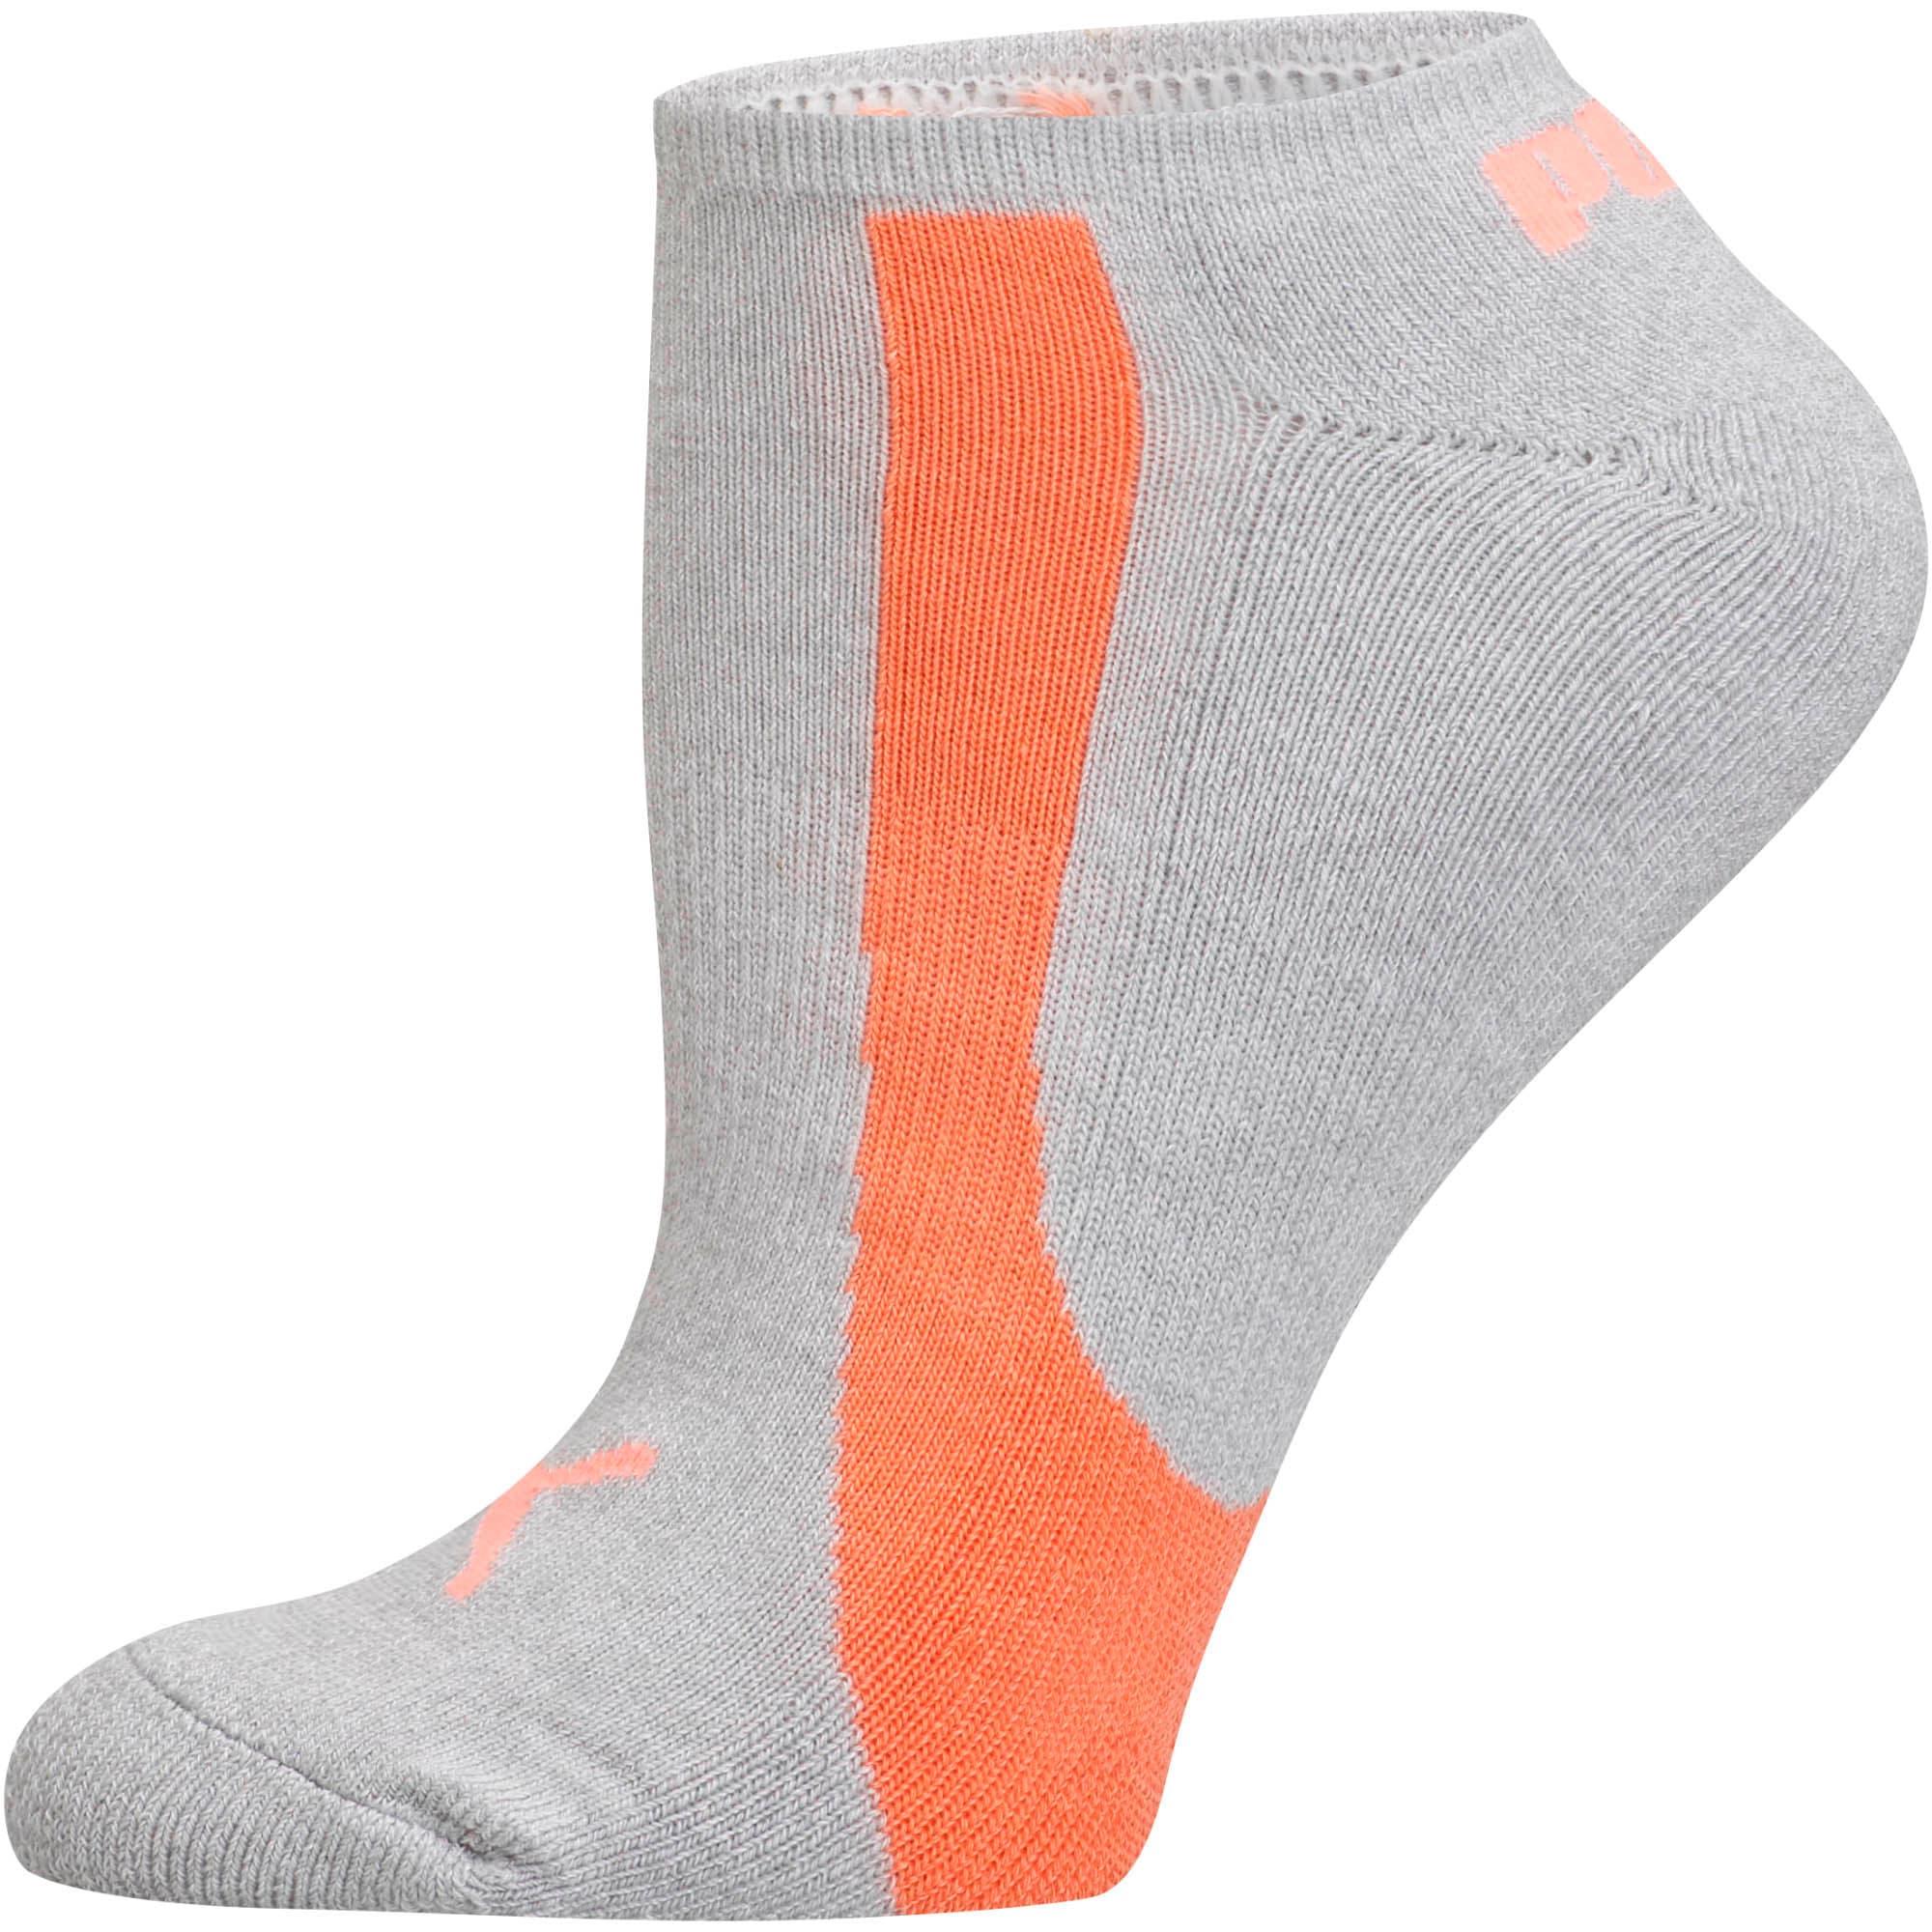 Thumbnail 3 of Women's No Show Socks [3 Pack], LT PASTEL PURPLE, medium